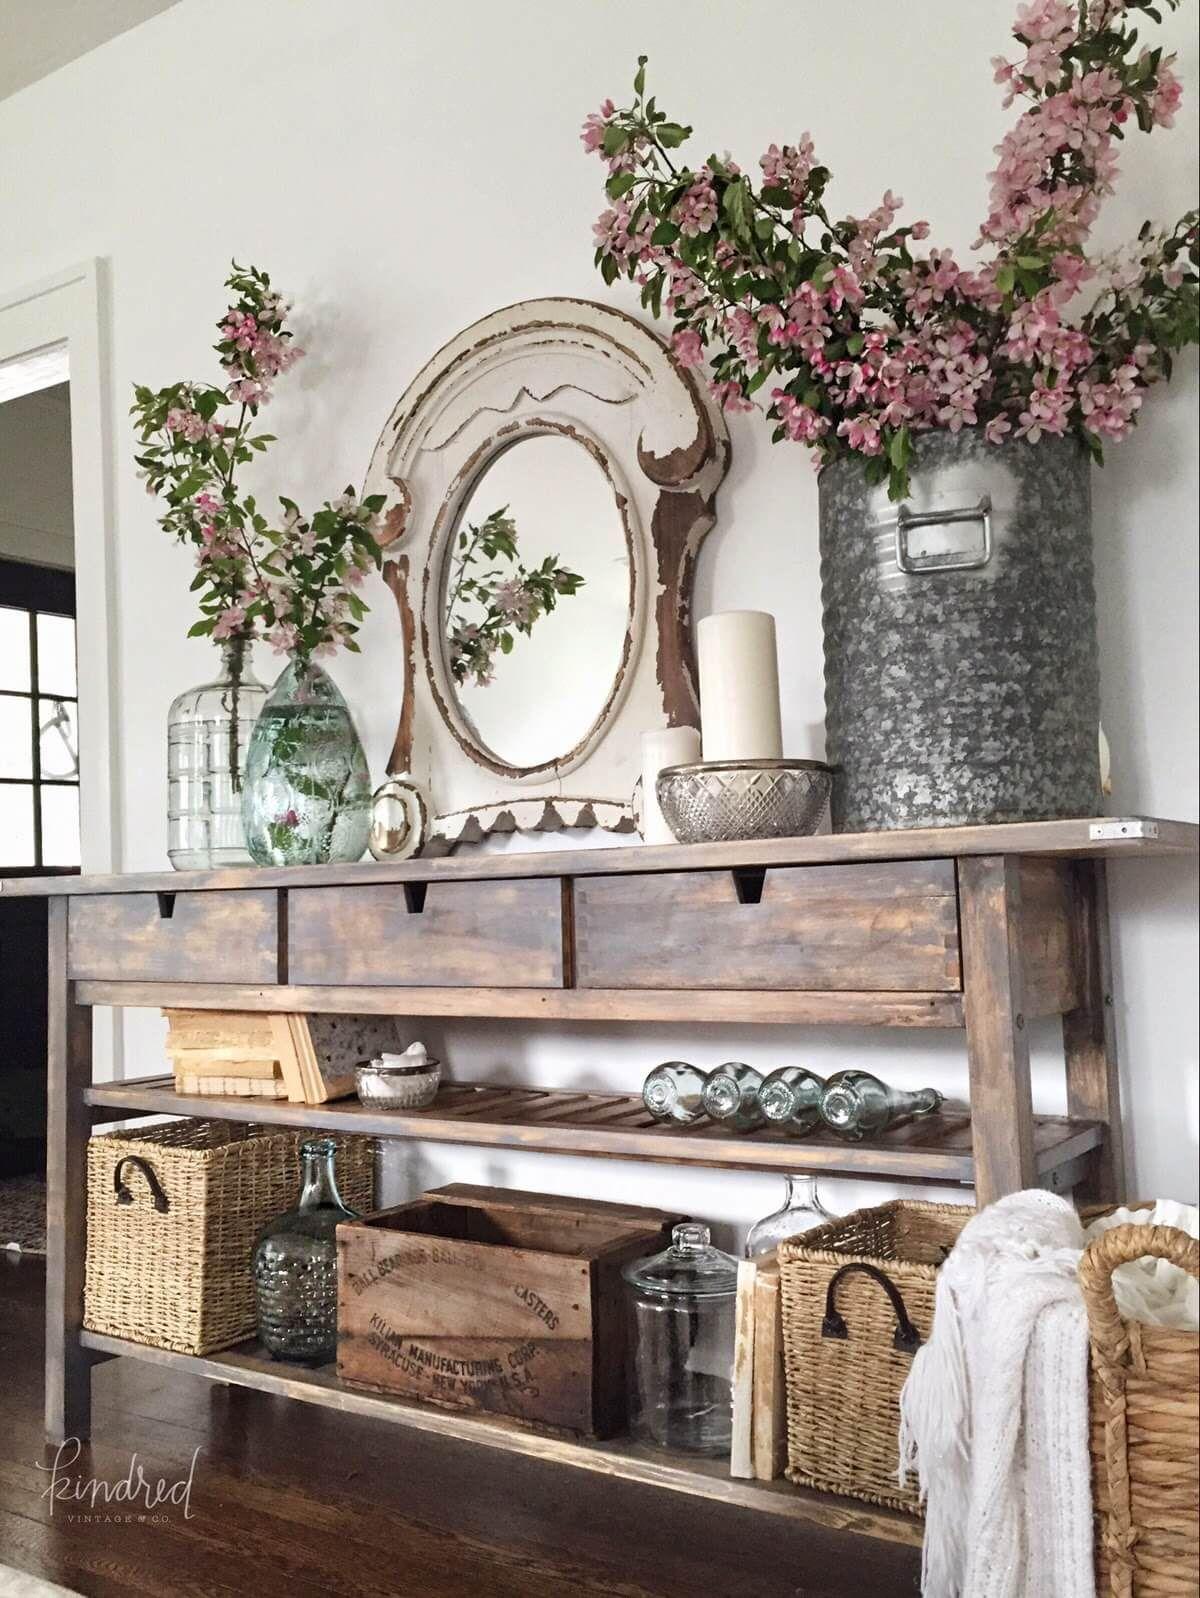 Rustikales badezimmer dekor diy rustikaler apothekerstil  ideen fürs hausbauen  pinterest